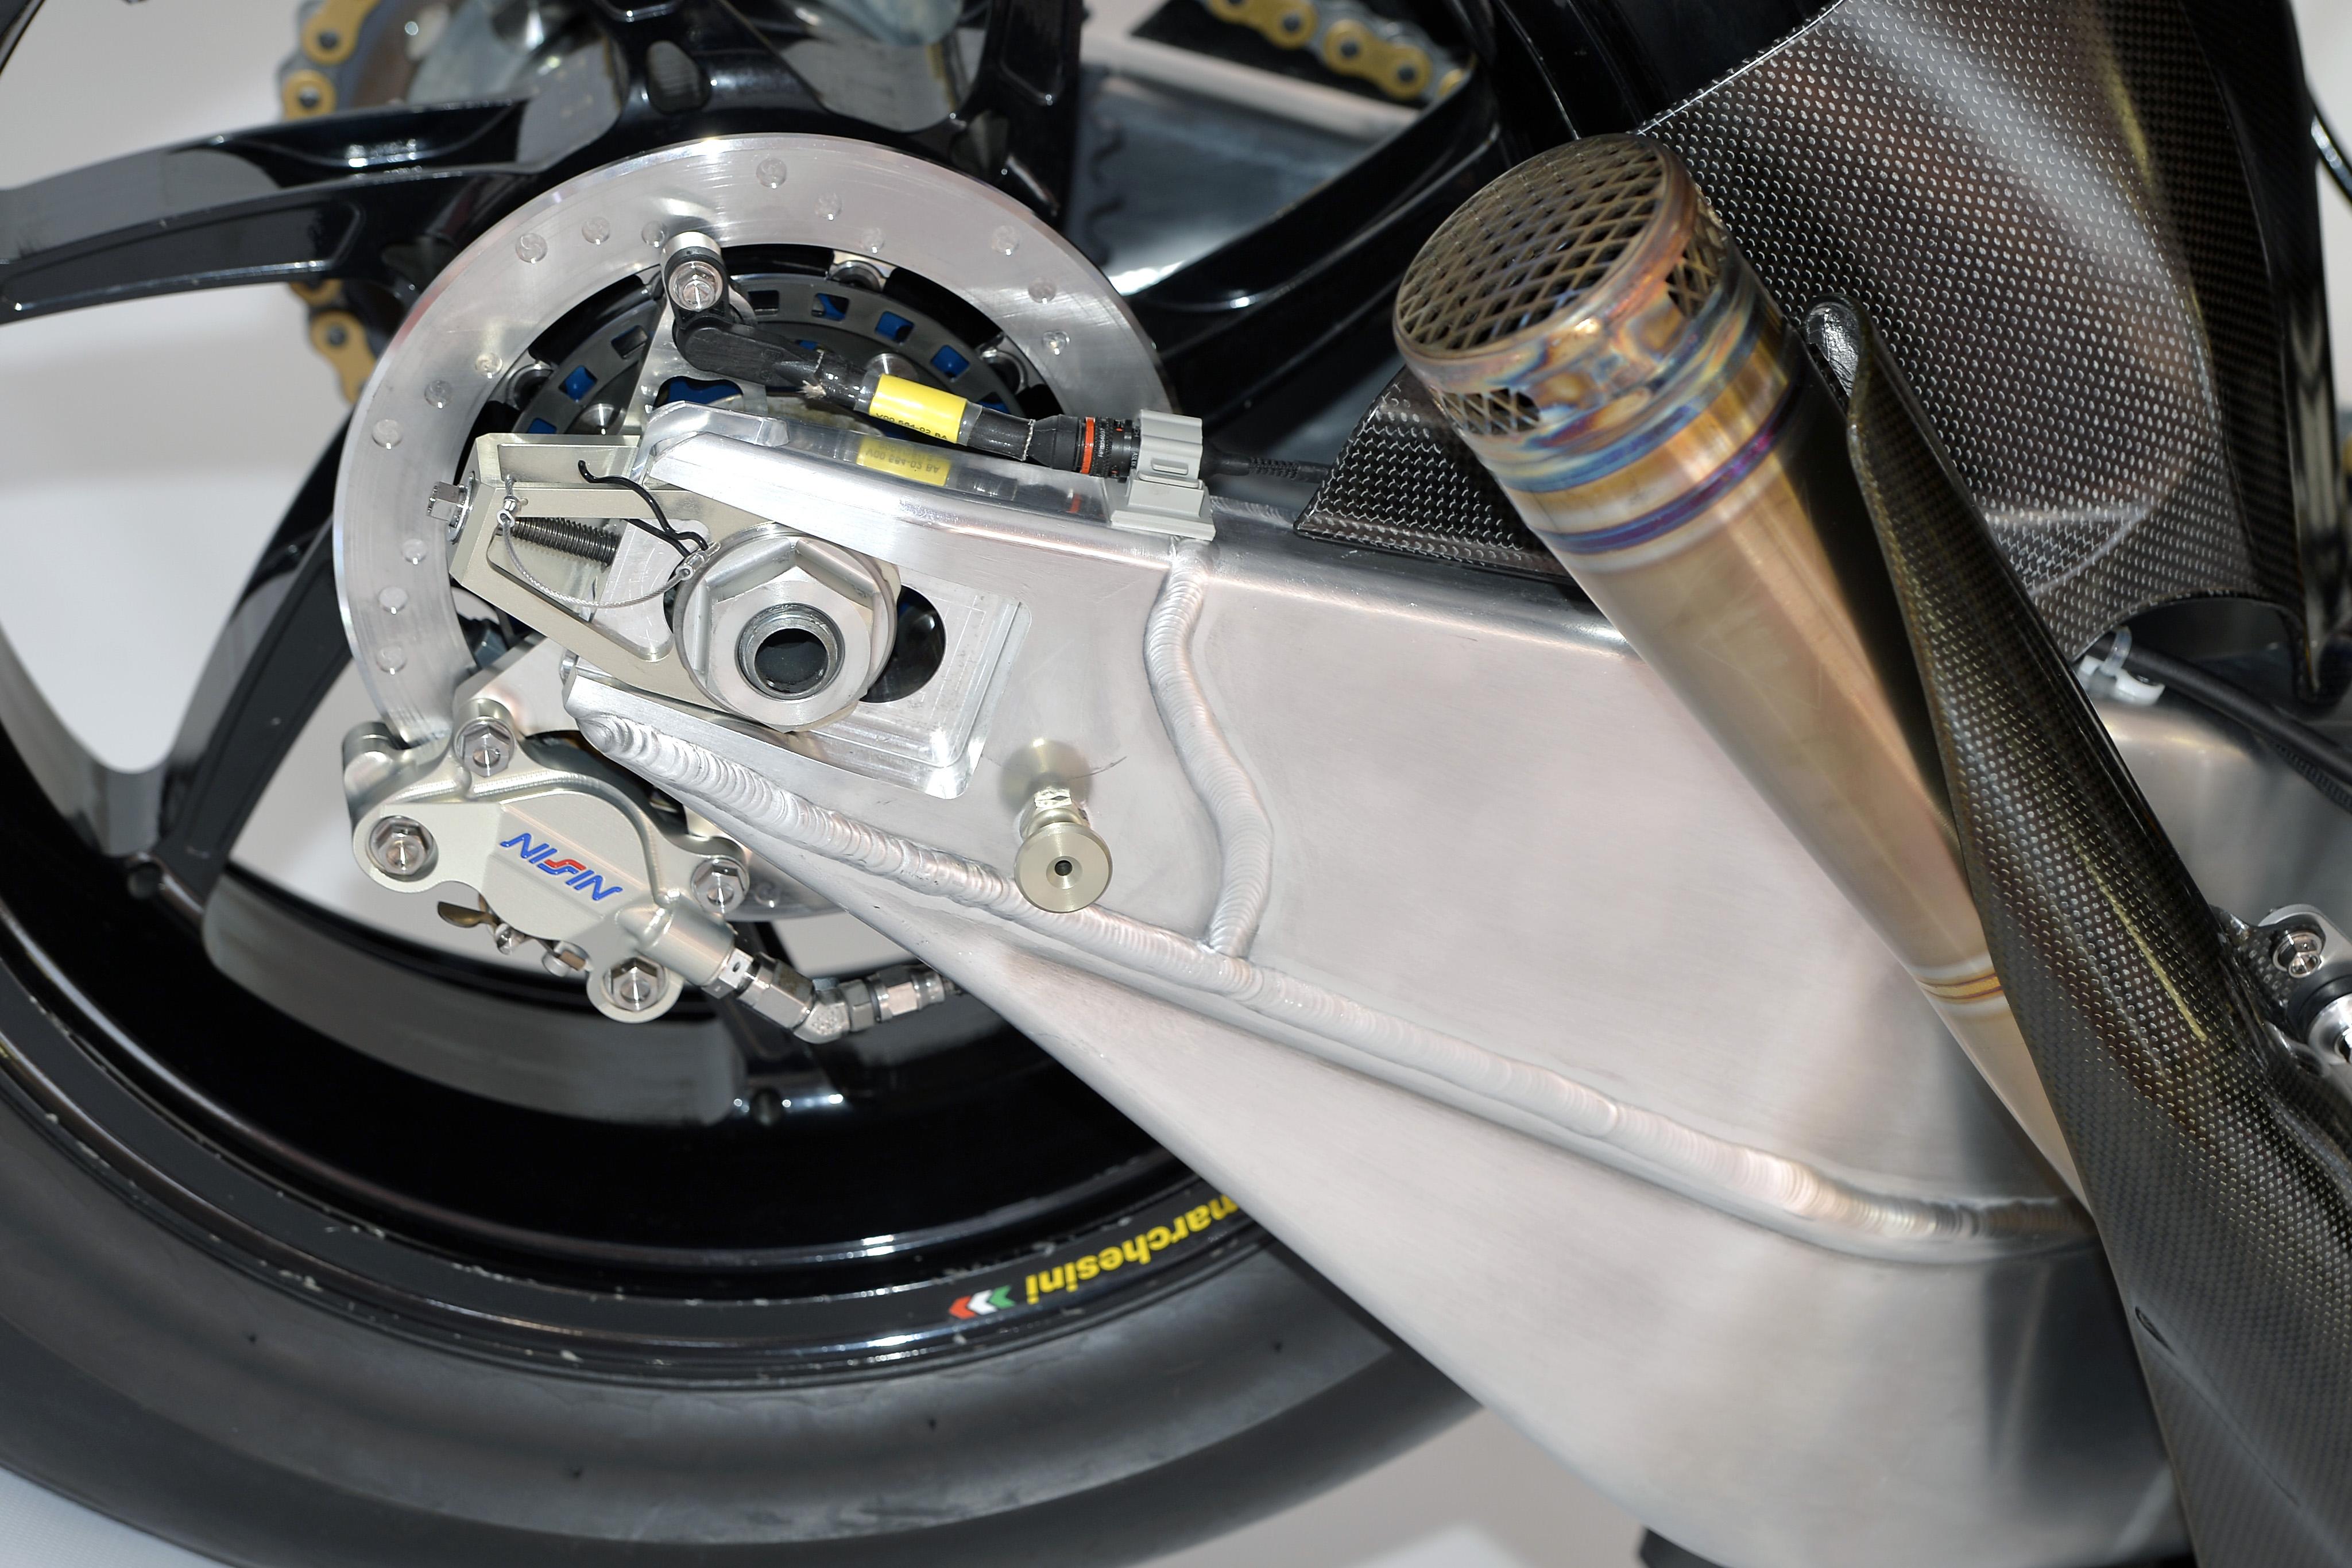 honda_rcv1000r_motogp_production_racer_www_racemoto_com_010